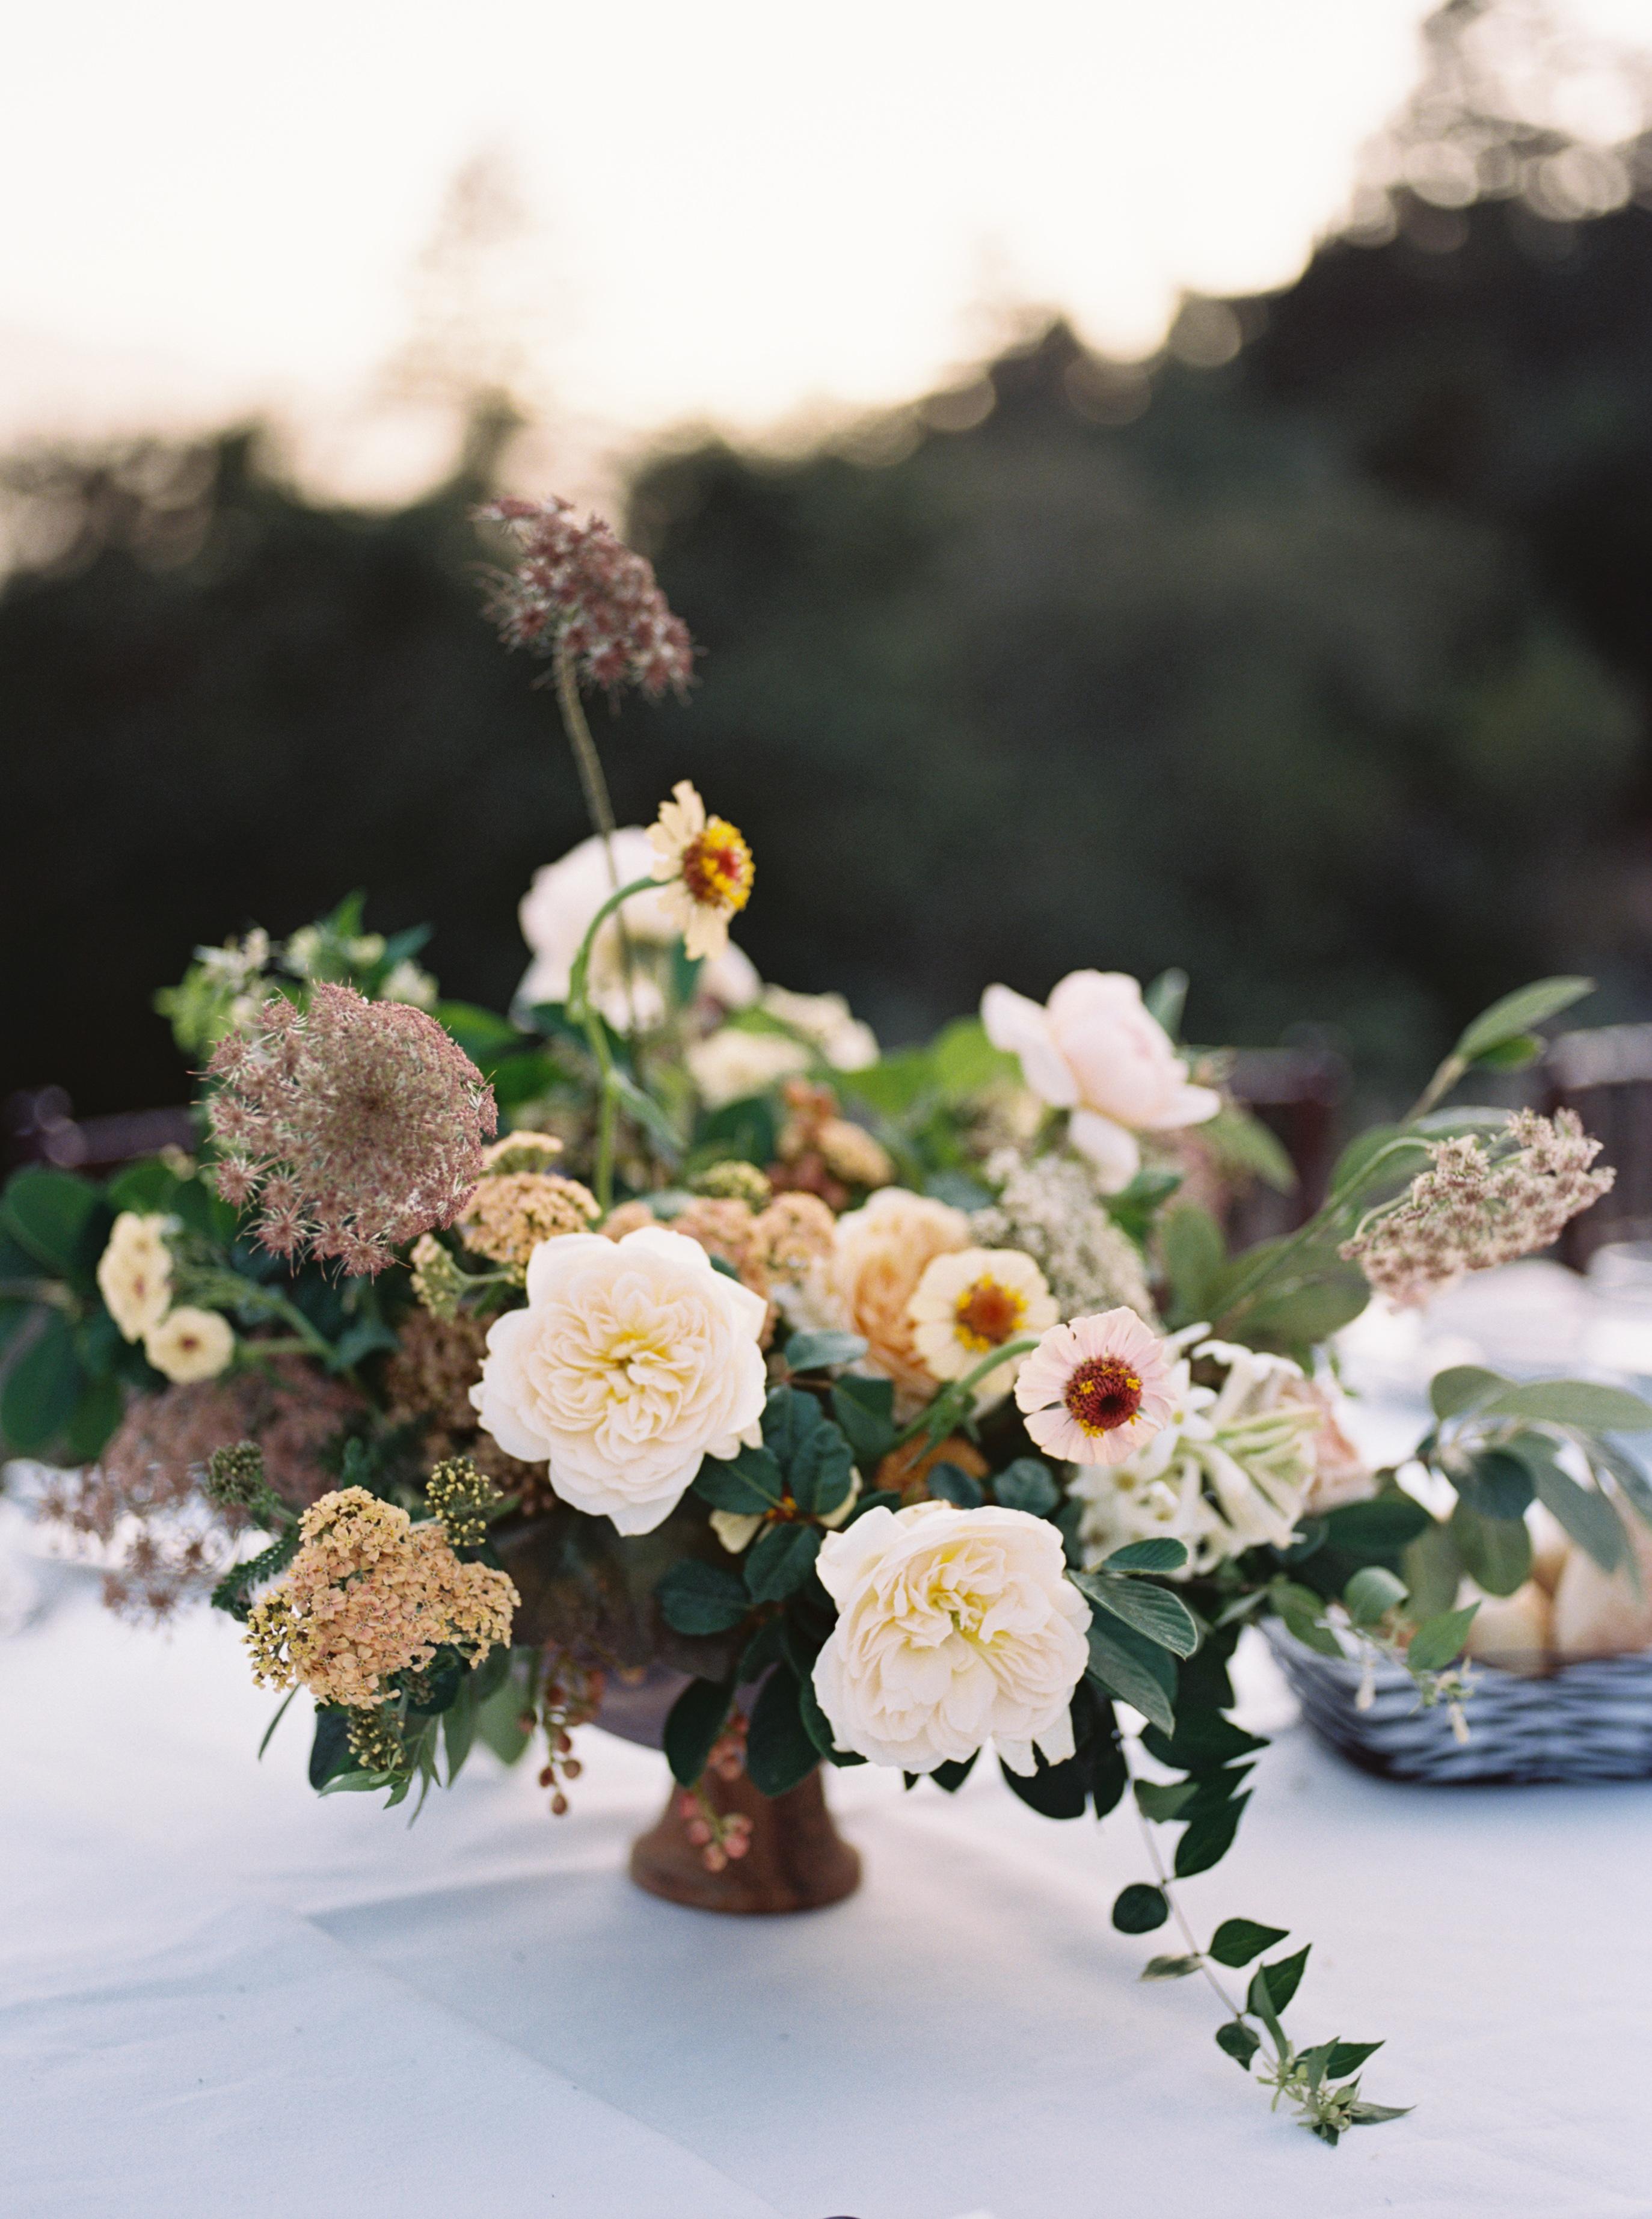 Thanksgiving Centerpiece Blooms